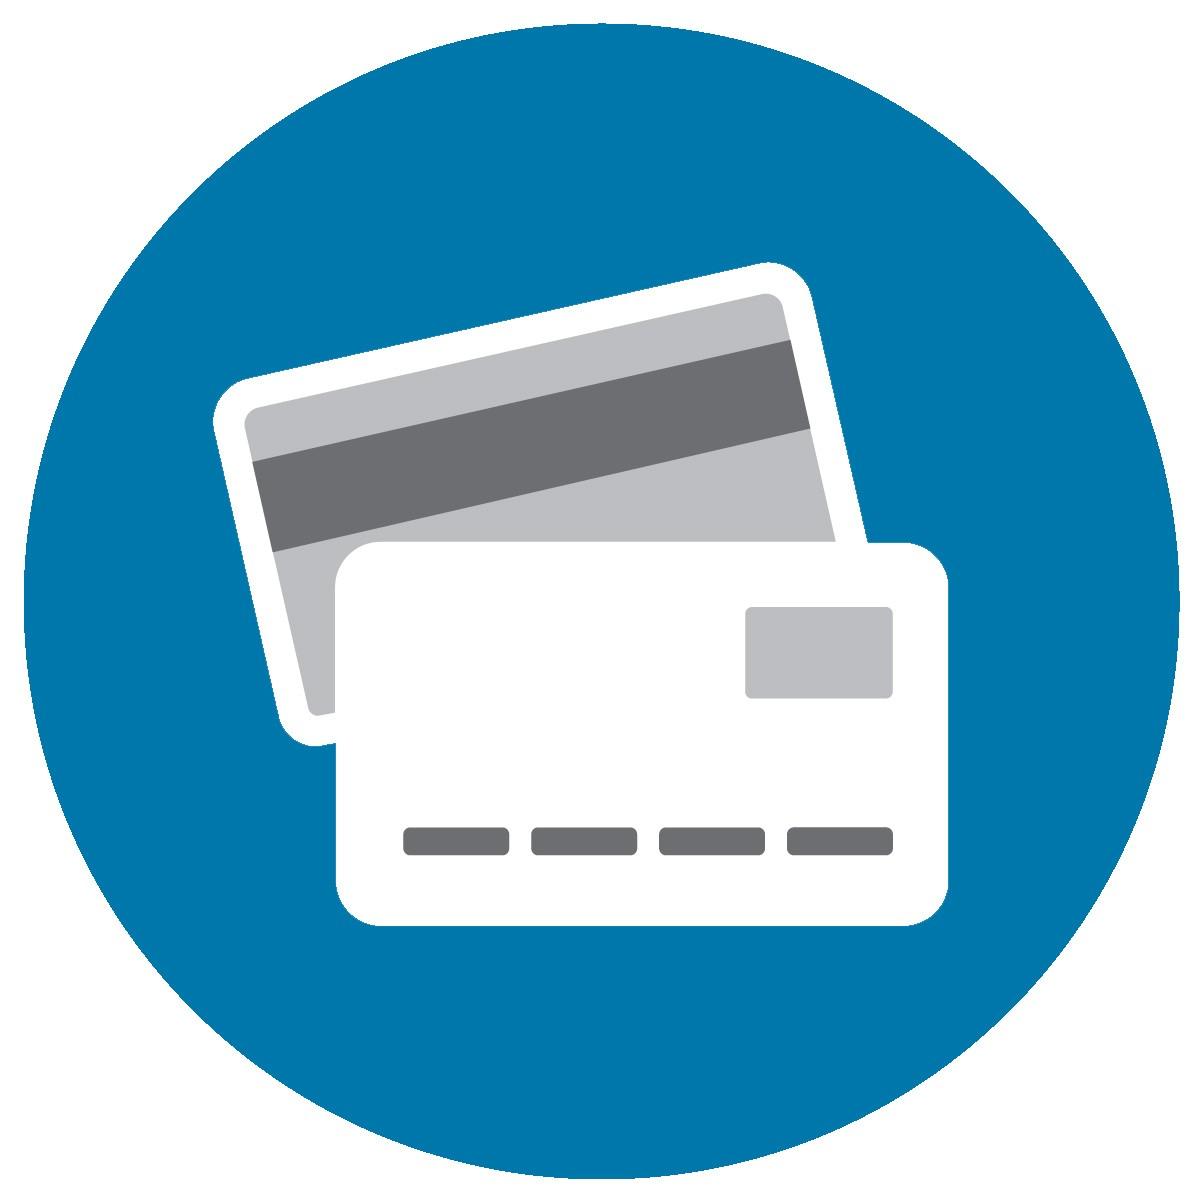 https://assets.engagement.ticketmaster.com/images/properties/371/images/6143621a49e78.jpg